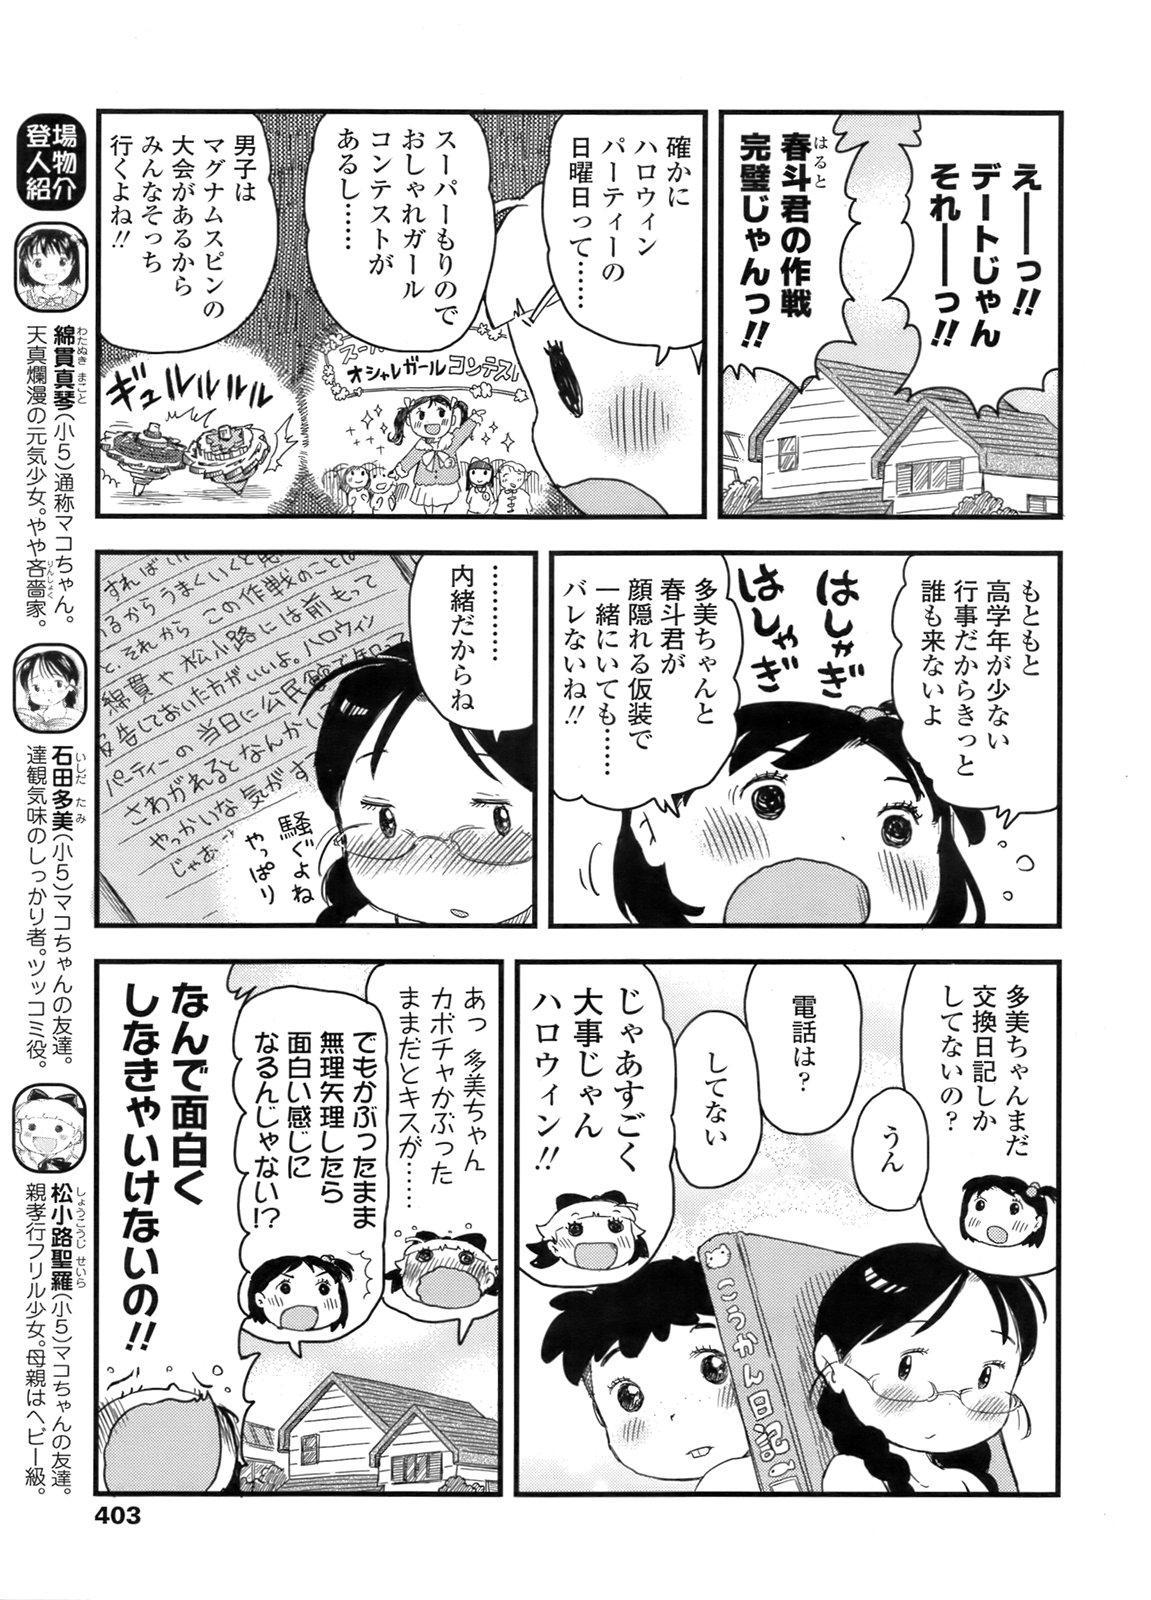 COMIC LO 2011-12 Vol. 93 403